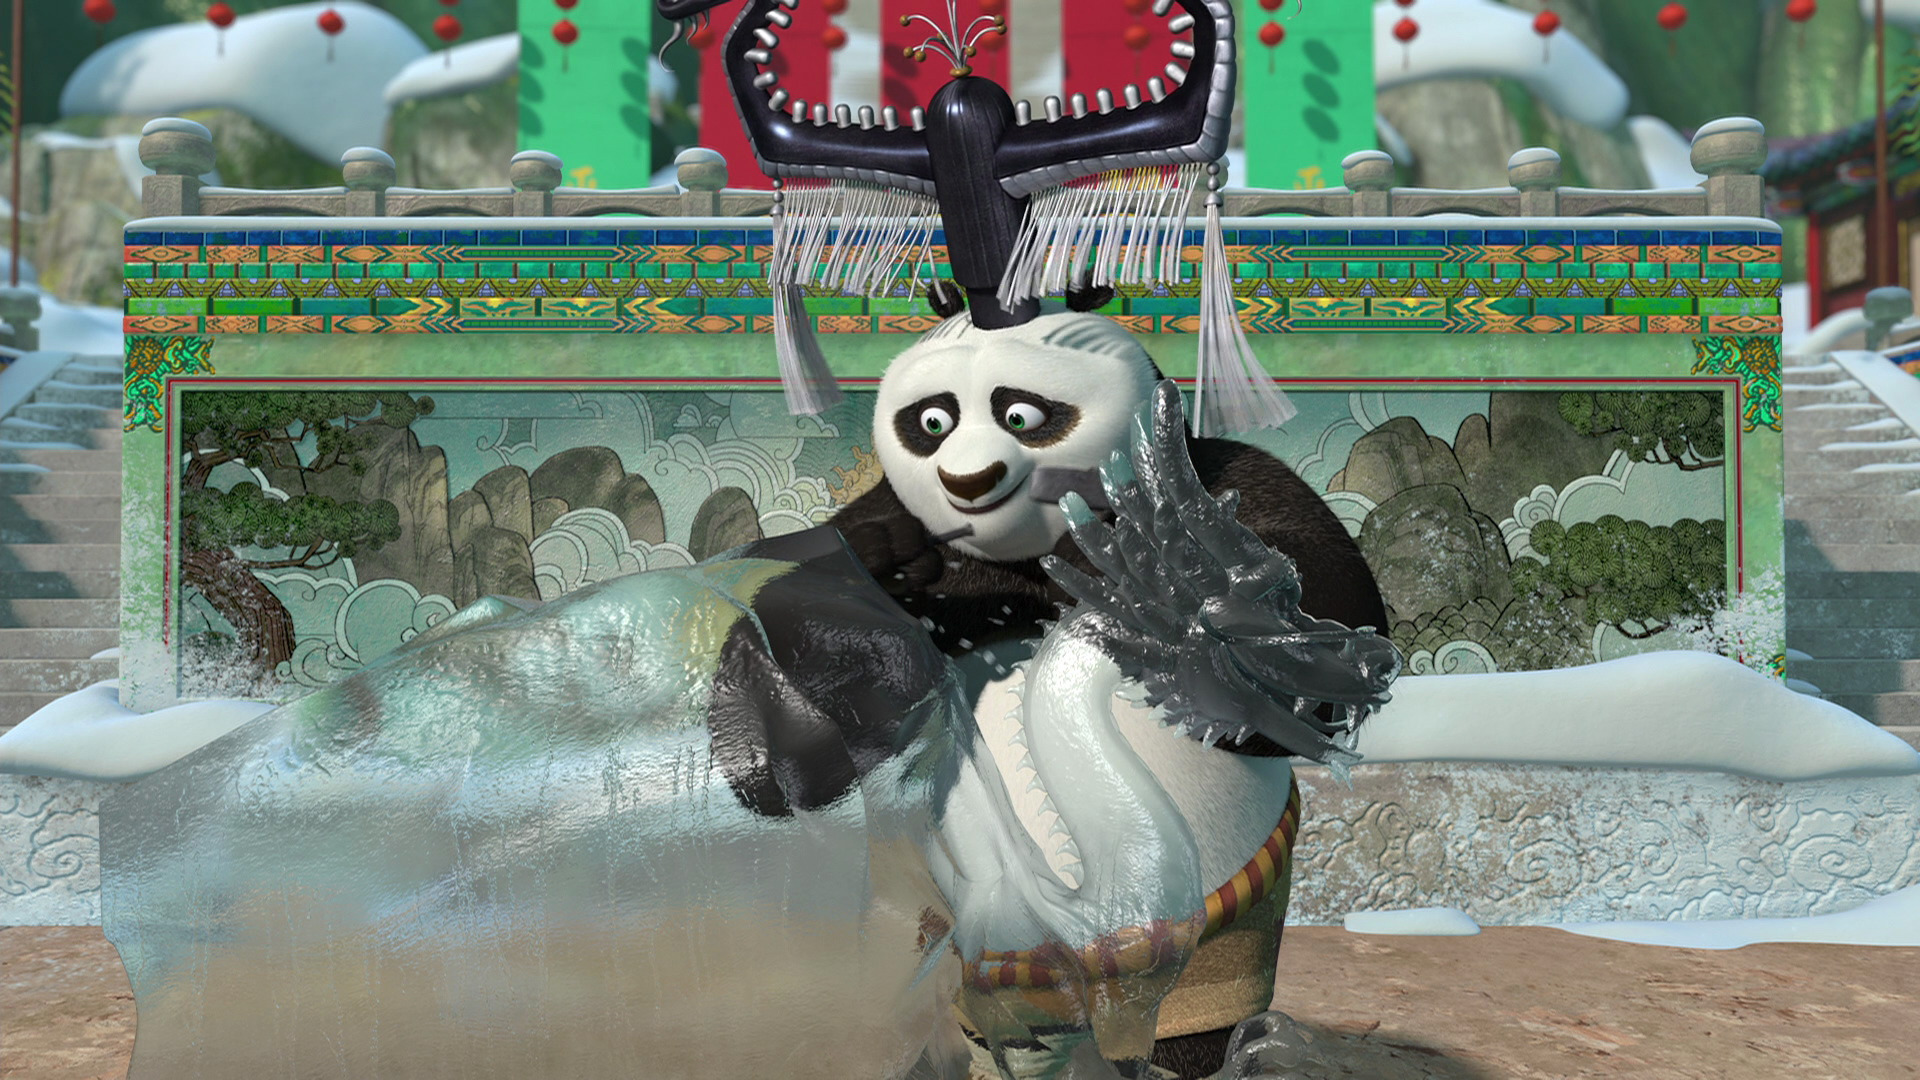 Kung Fu Panda Holiday Special 720p HDTV-KmG.mkv snapshot 11.19 -2012.02.13 17.59.42-.jpg